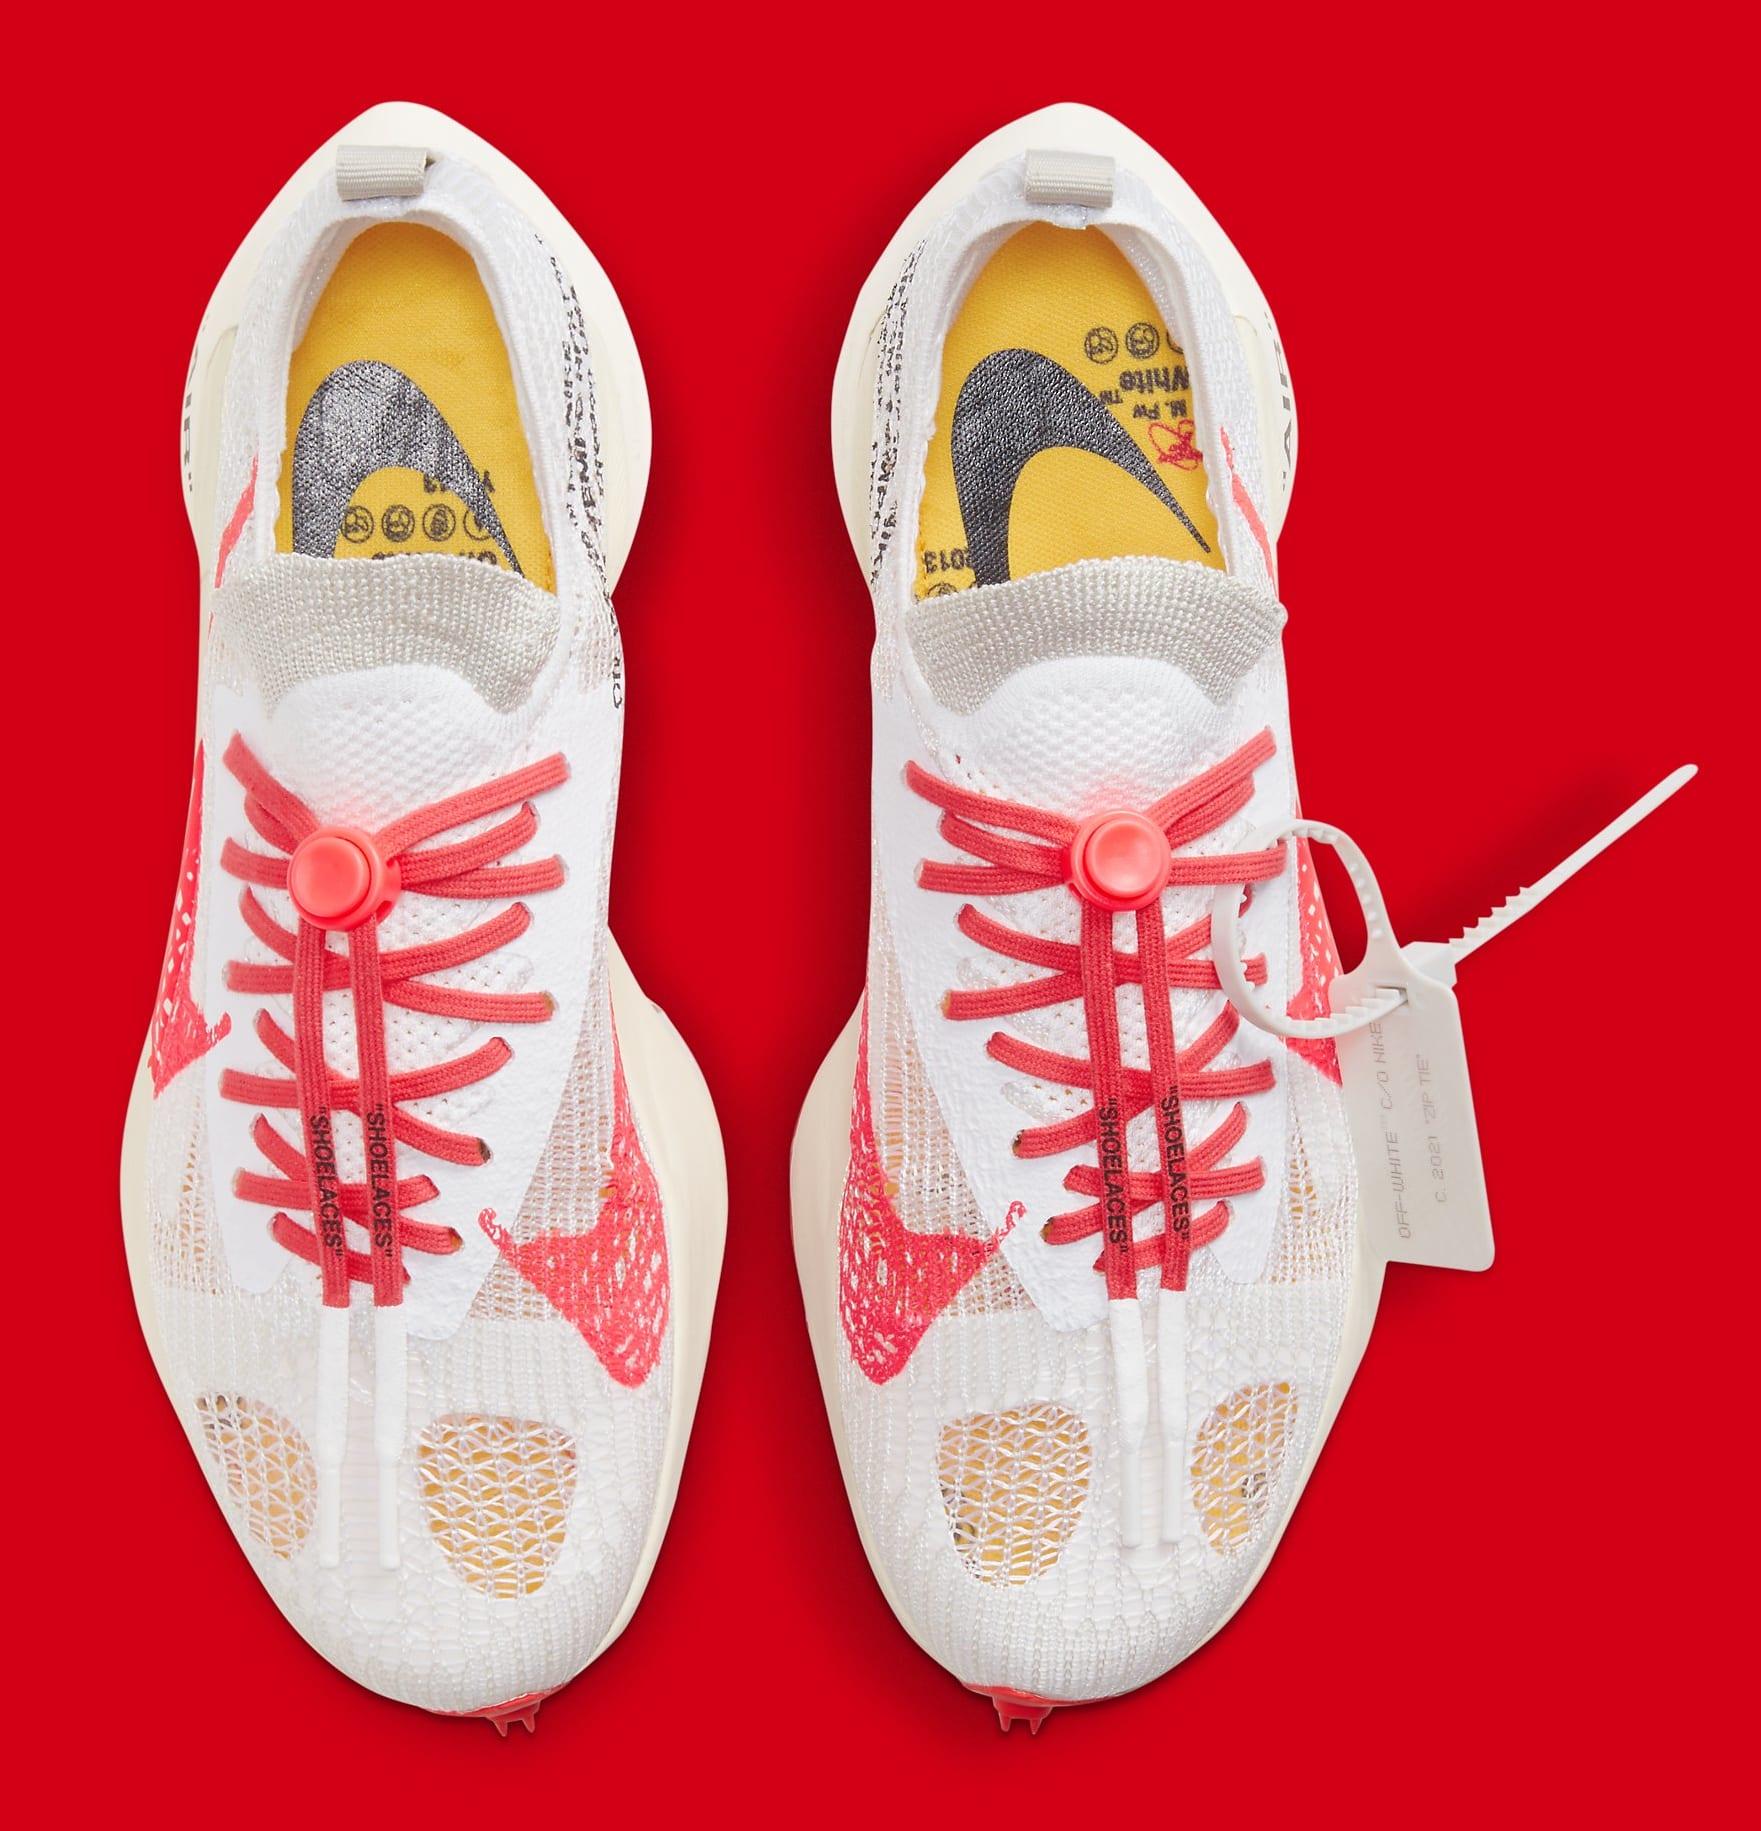 Off-White x Nike Air Zoom Tempo Next% CV0697-100 Top